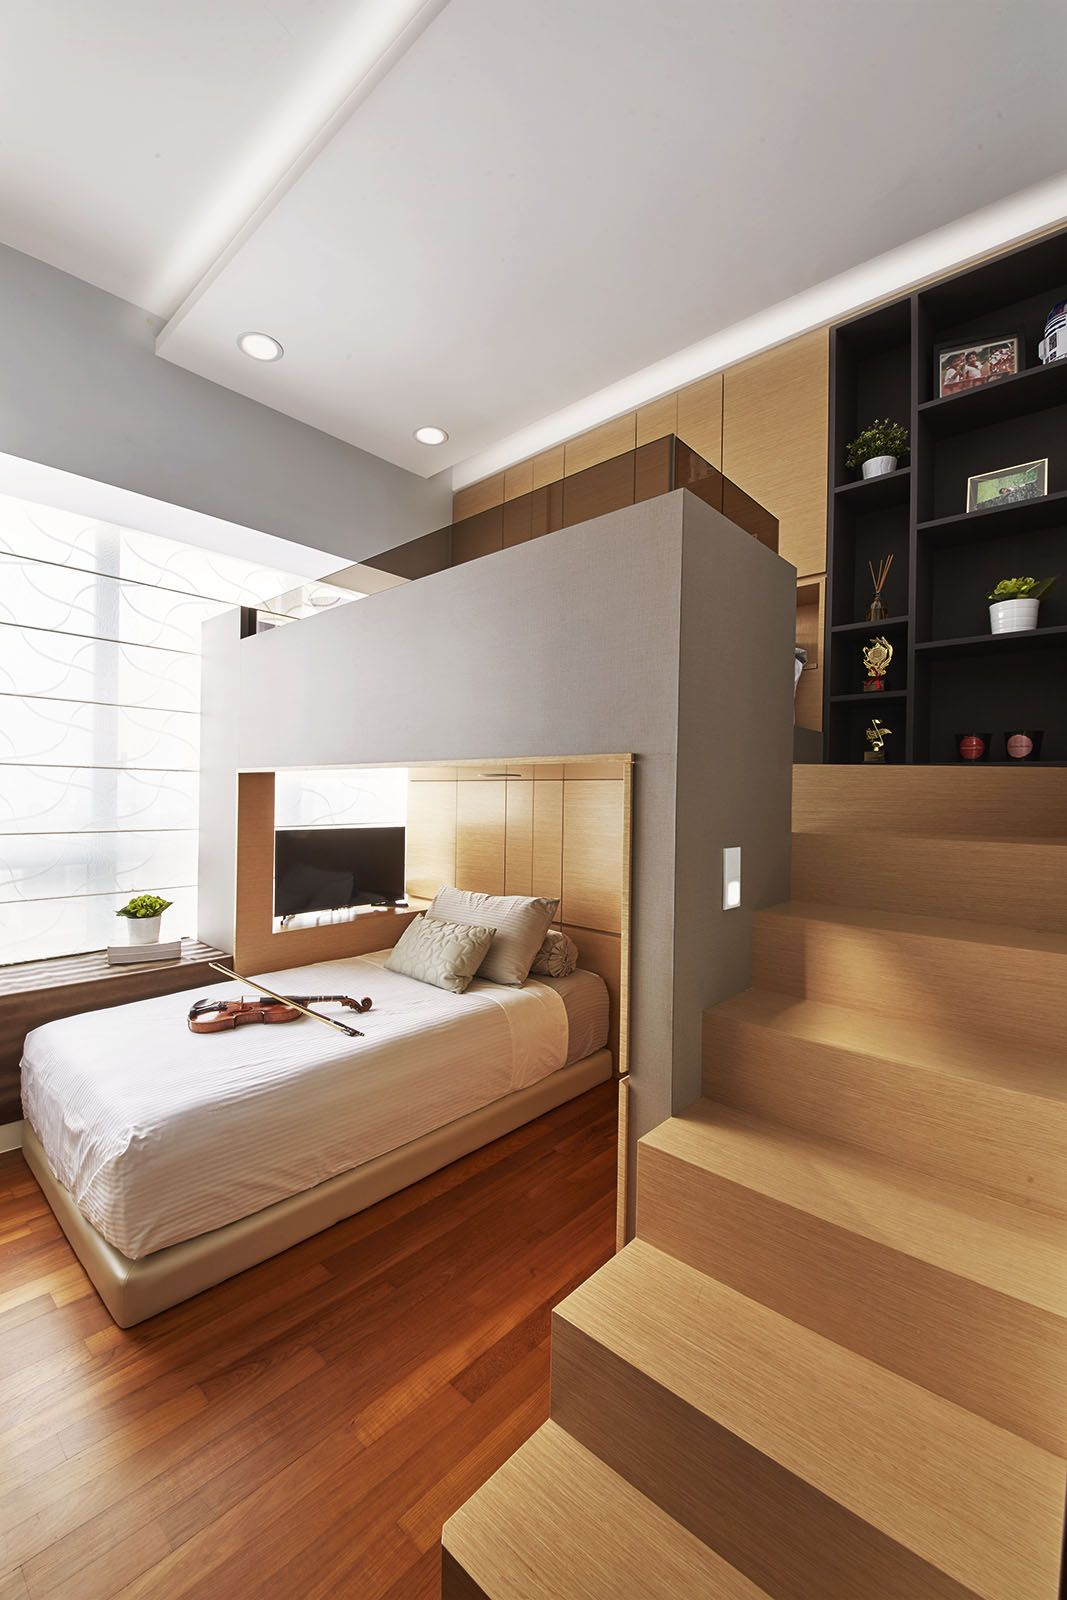 Interior Design Singapore Home Interior Design Singapore Home Room Design Small Room Design Interior Design Singapore